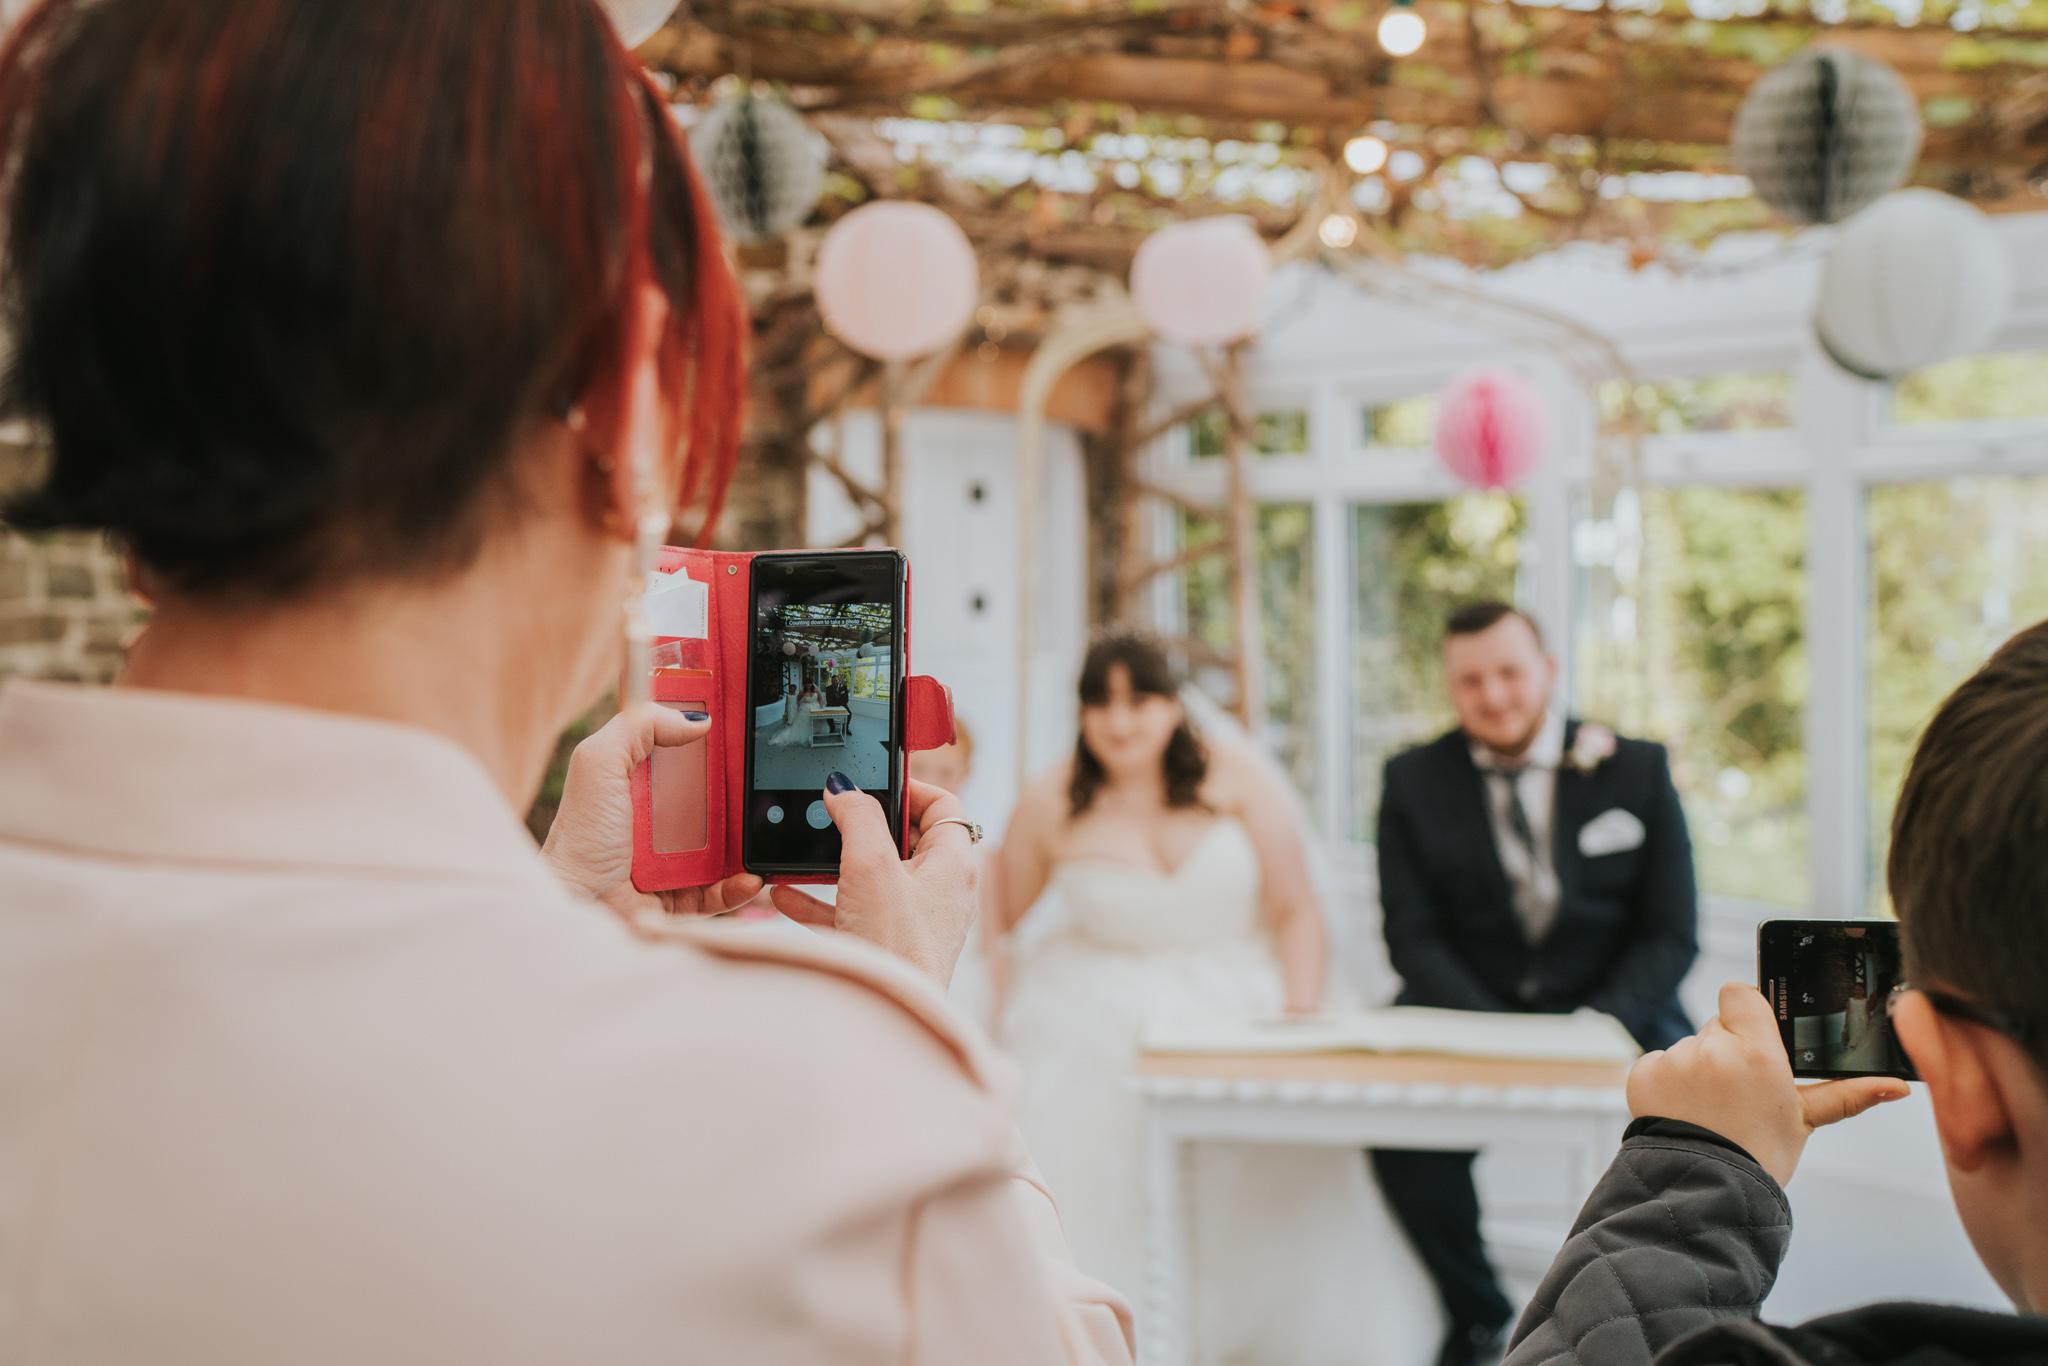 grace-sam-old-barn-clovelly-devon-wedding-photographer-grace-elizabeth-essex-suffolk-norfolk-wedding-photographer (65 of 132).jpg